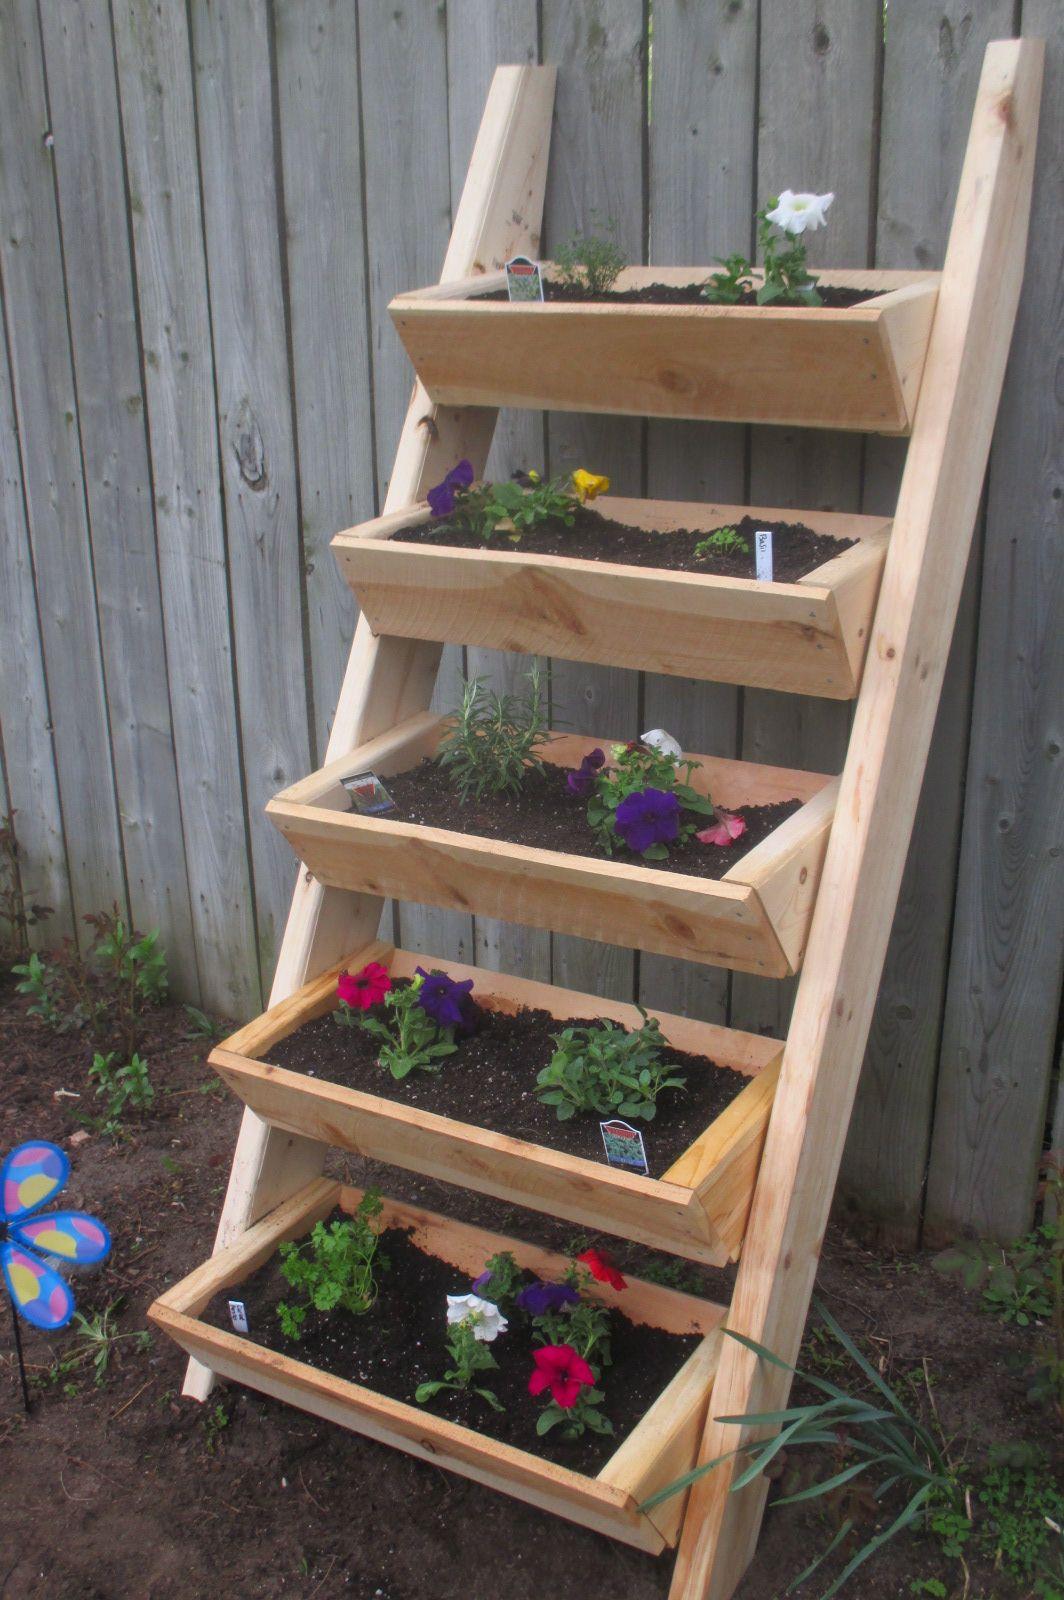 Ana White Herb Flower Ladder Diy Projects Diy 640 x 480